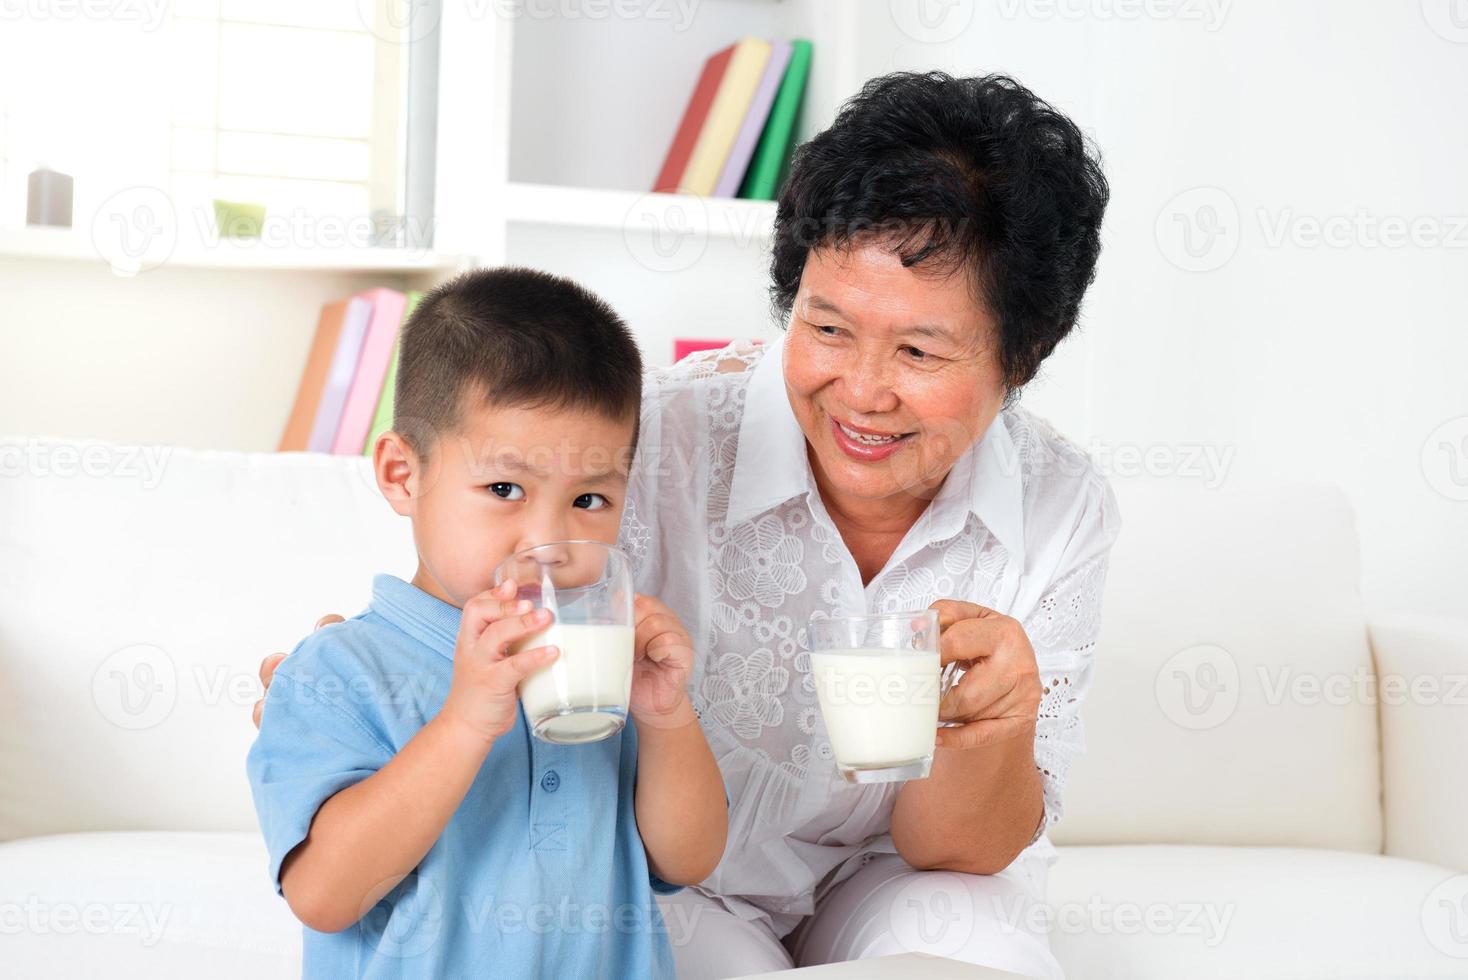 Drink milk together photo